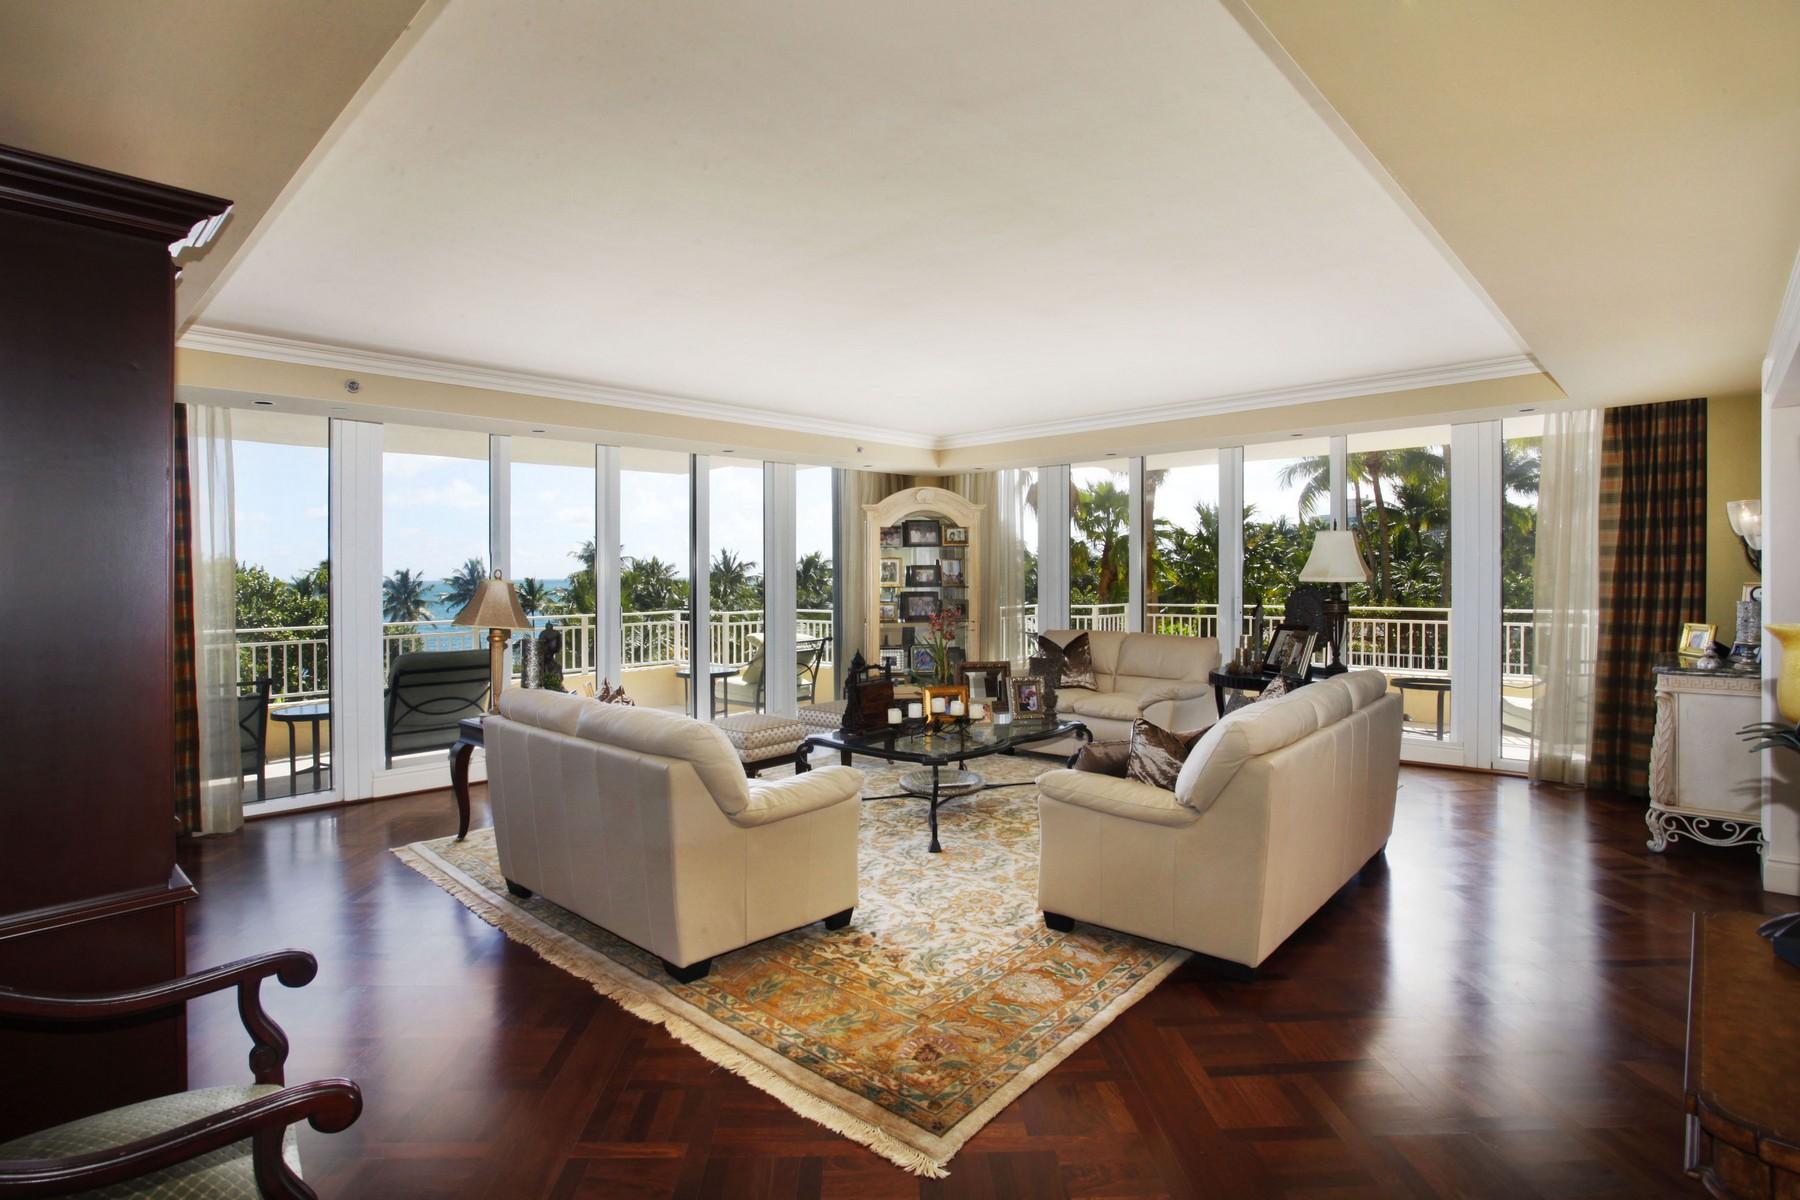 Property For Sale at 791 Crandon Blv #304